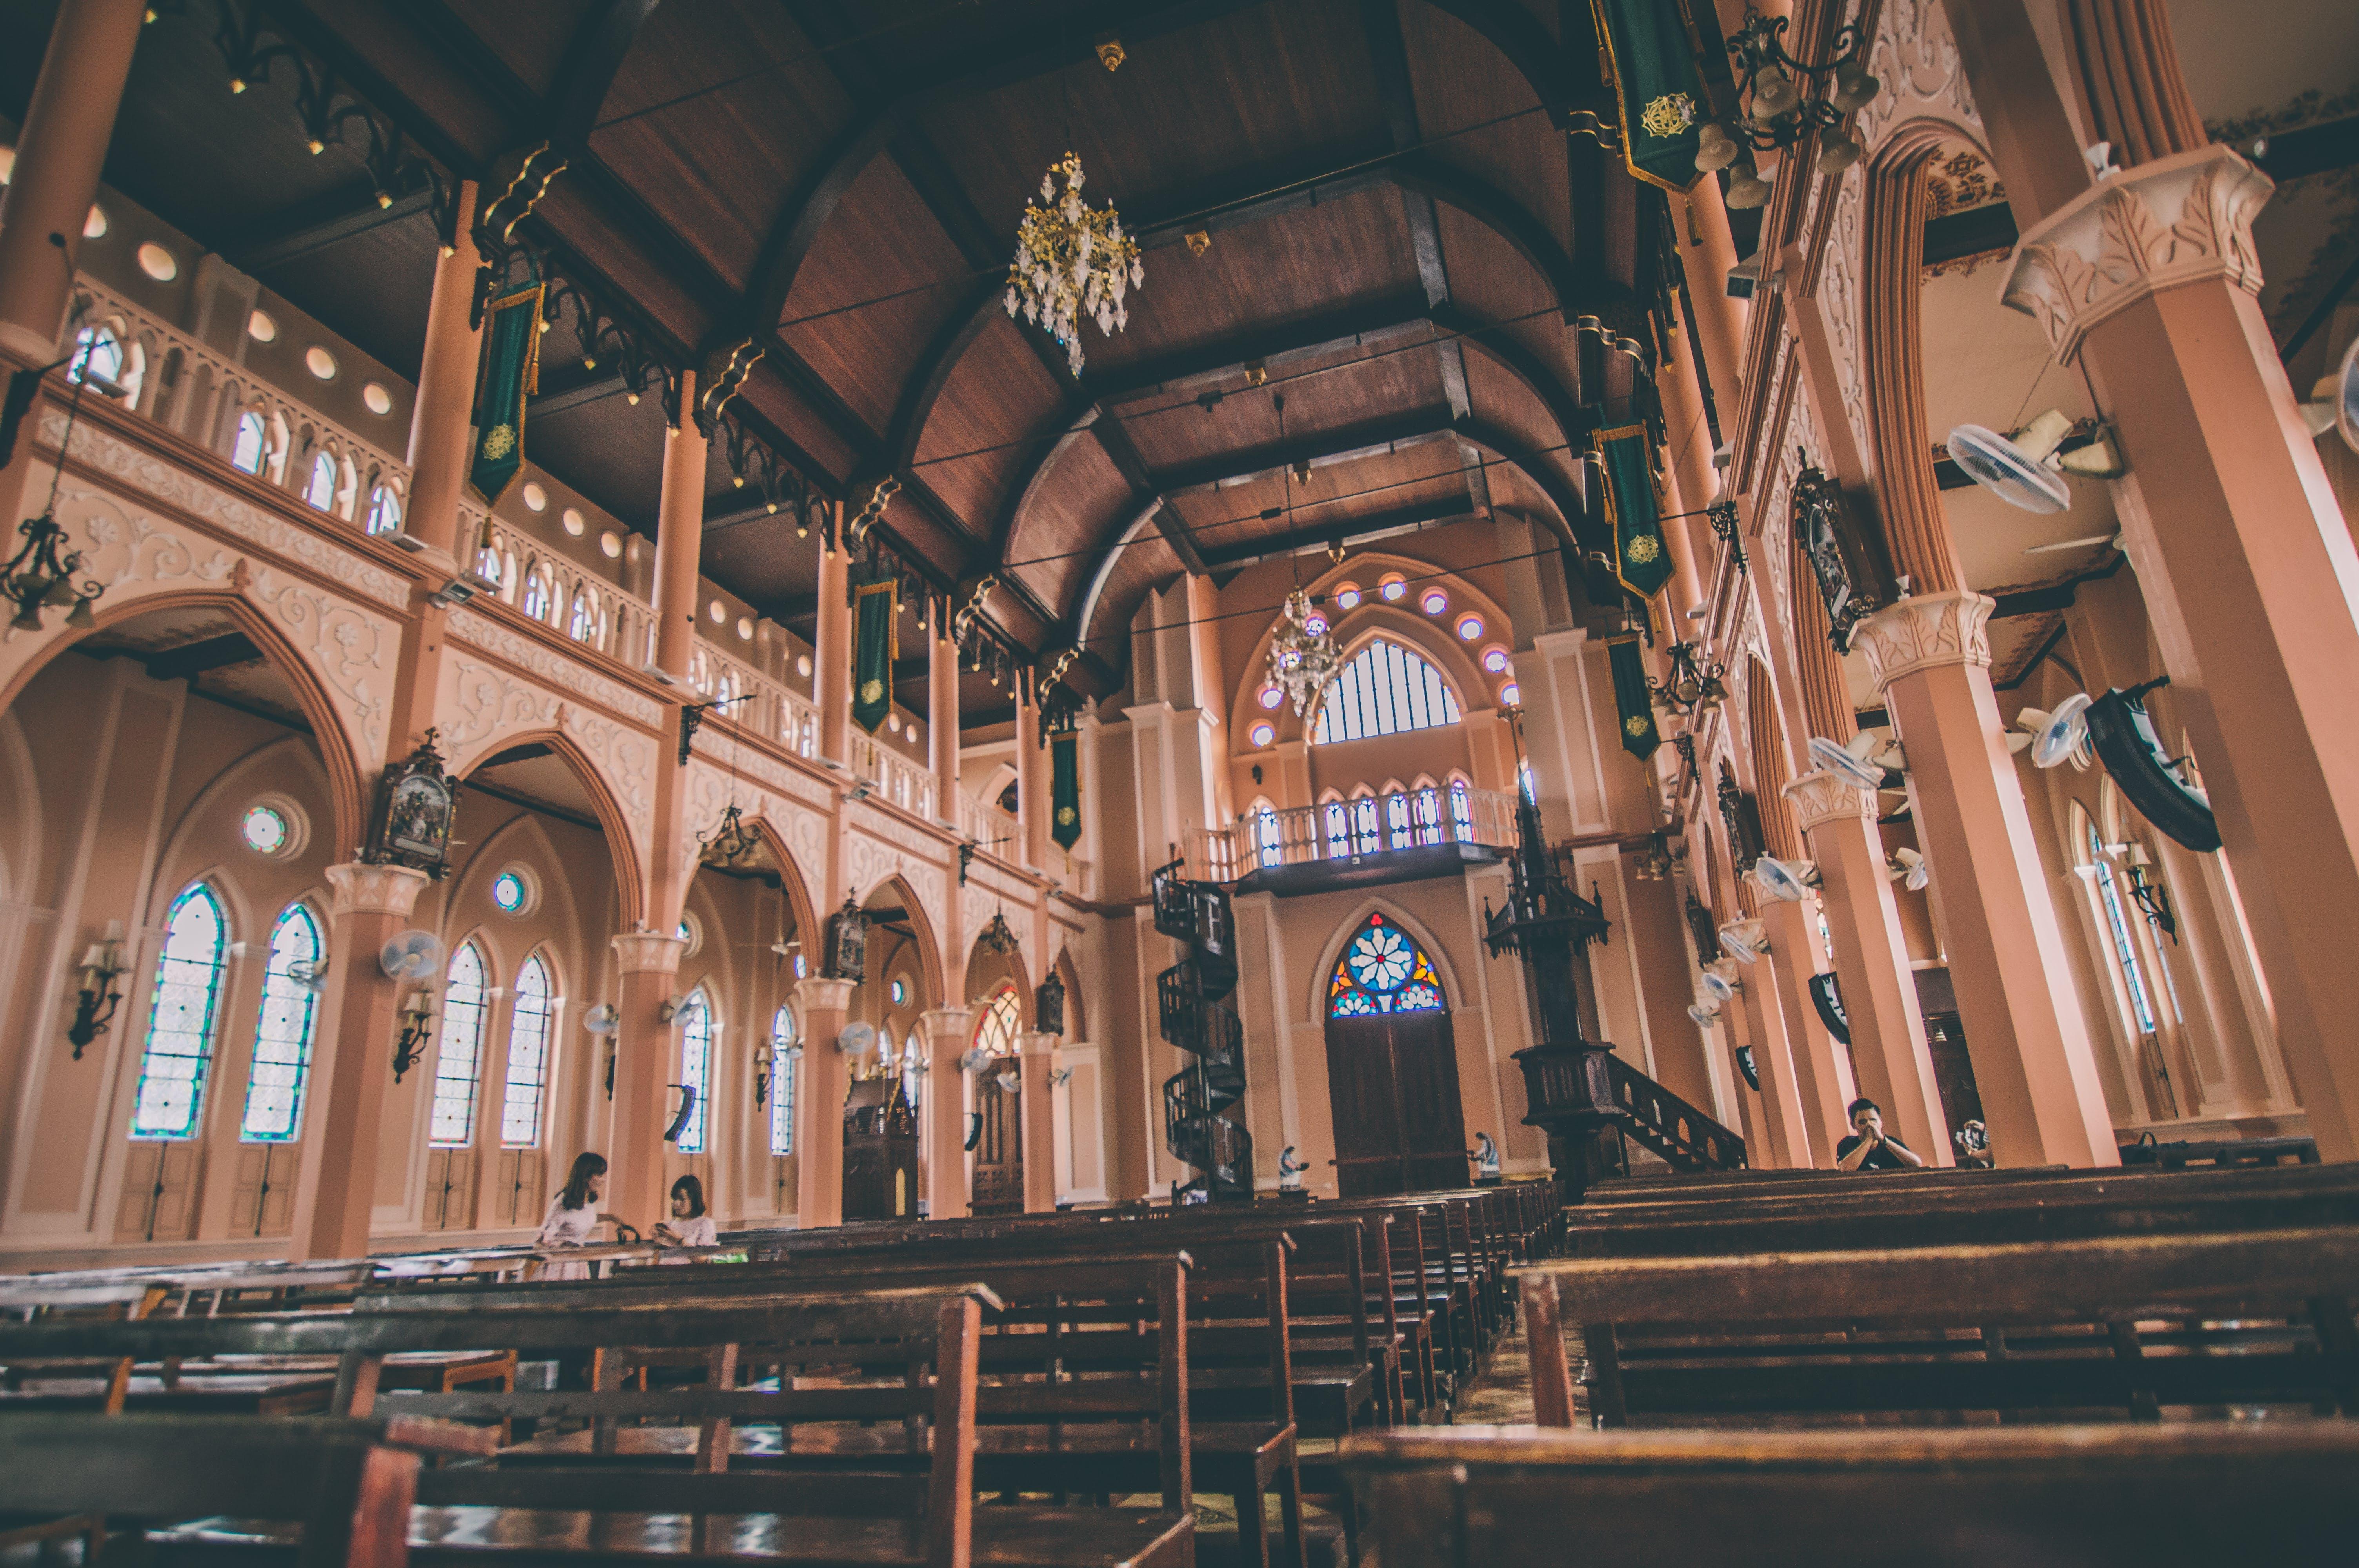 Brown Seats Inside A Church